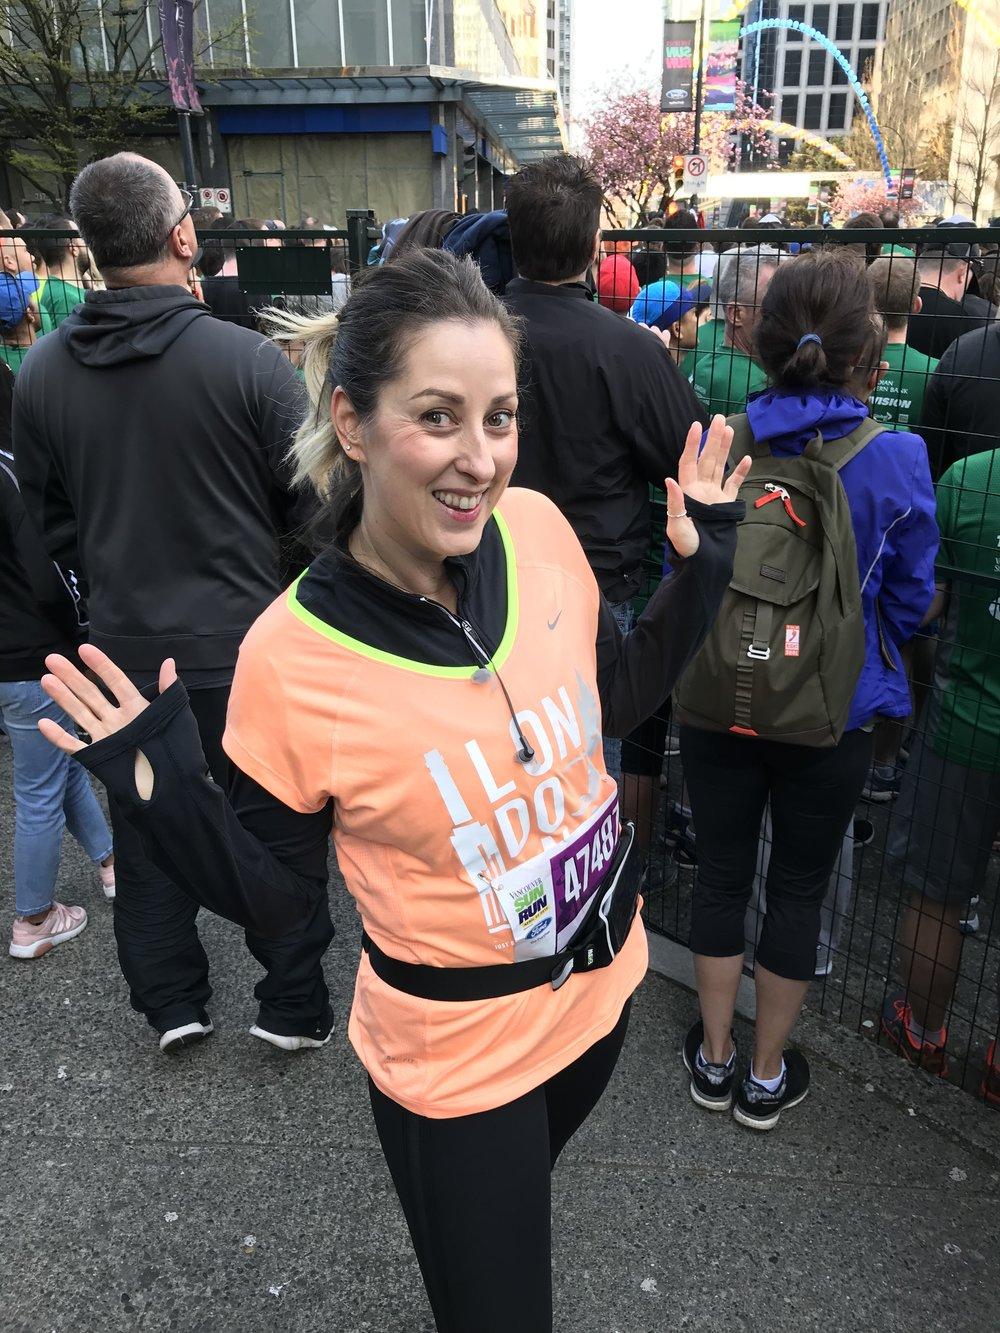 Me on my 46th birthday running the Vancouver Sun Run 10K